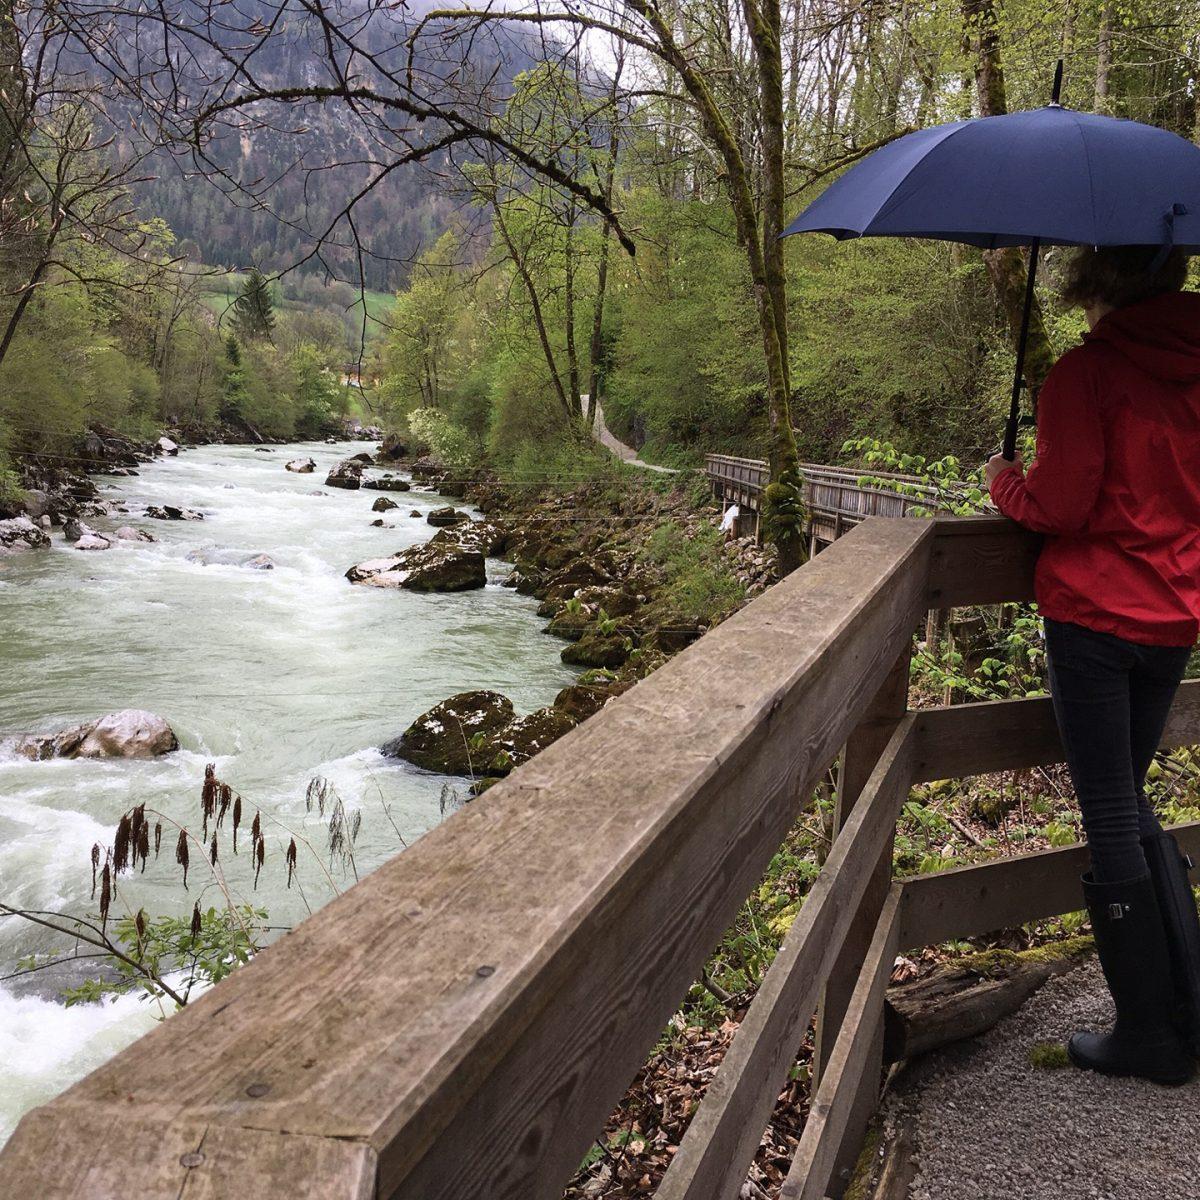 Hiking in the rain along the Saalach river » SalzburgerLand com